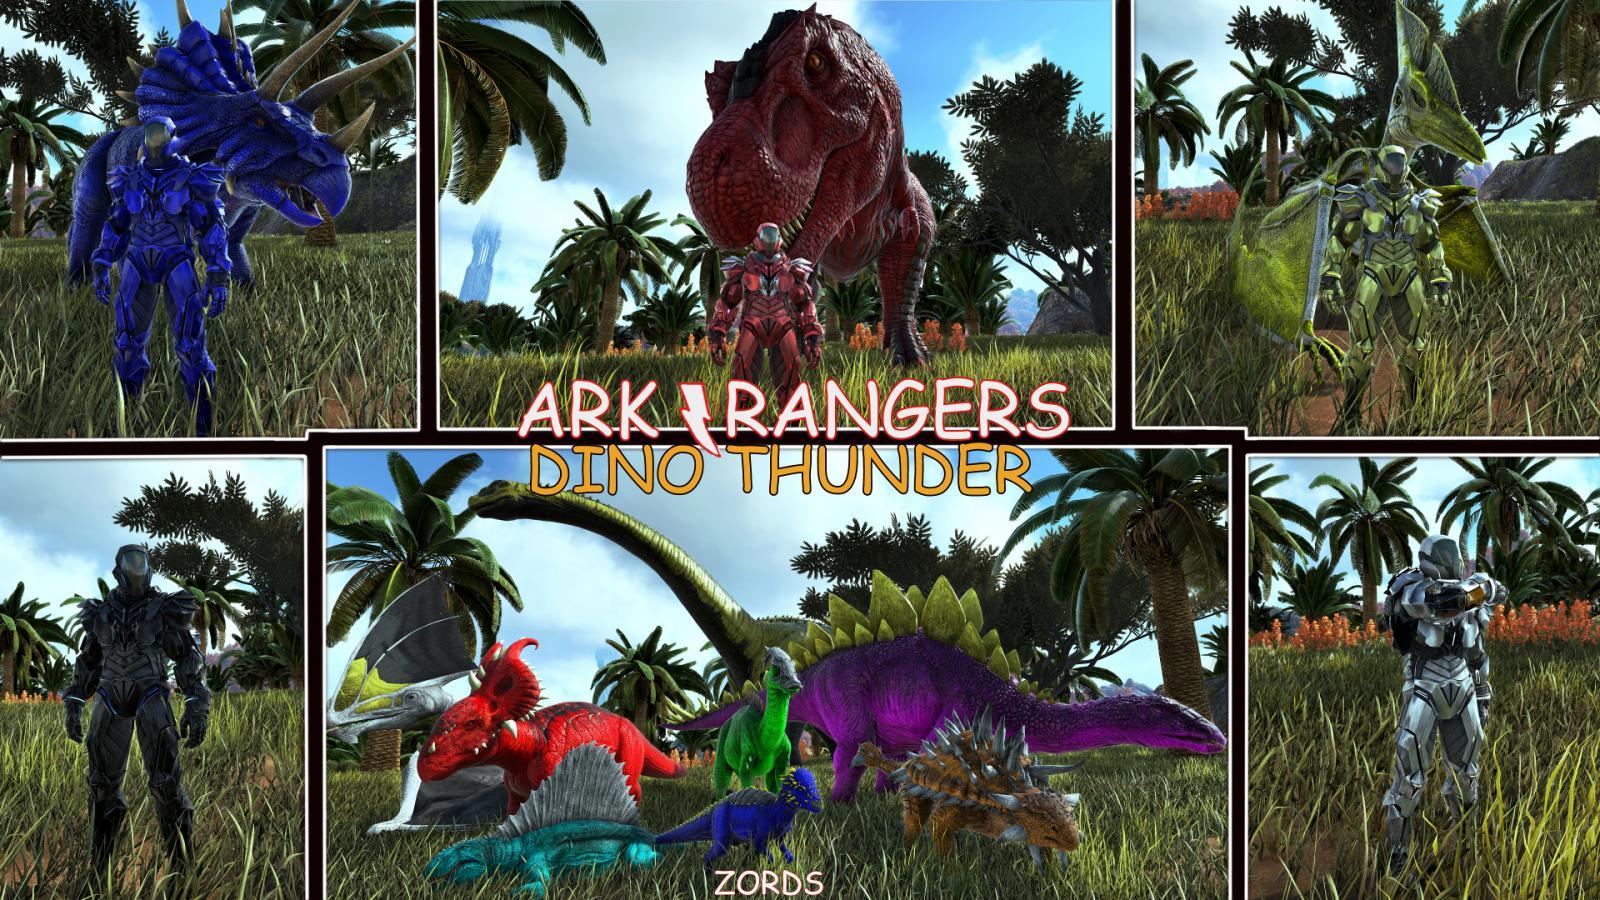 large.59175fa4bb528_WolfAngelus-ARKRangersDinoThunder-Freeformsta.jpg